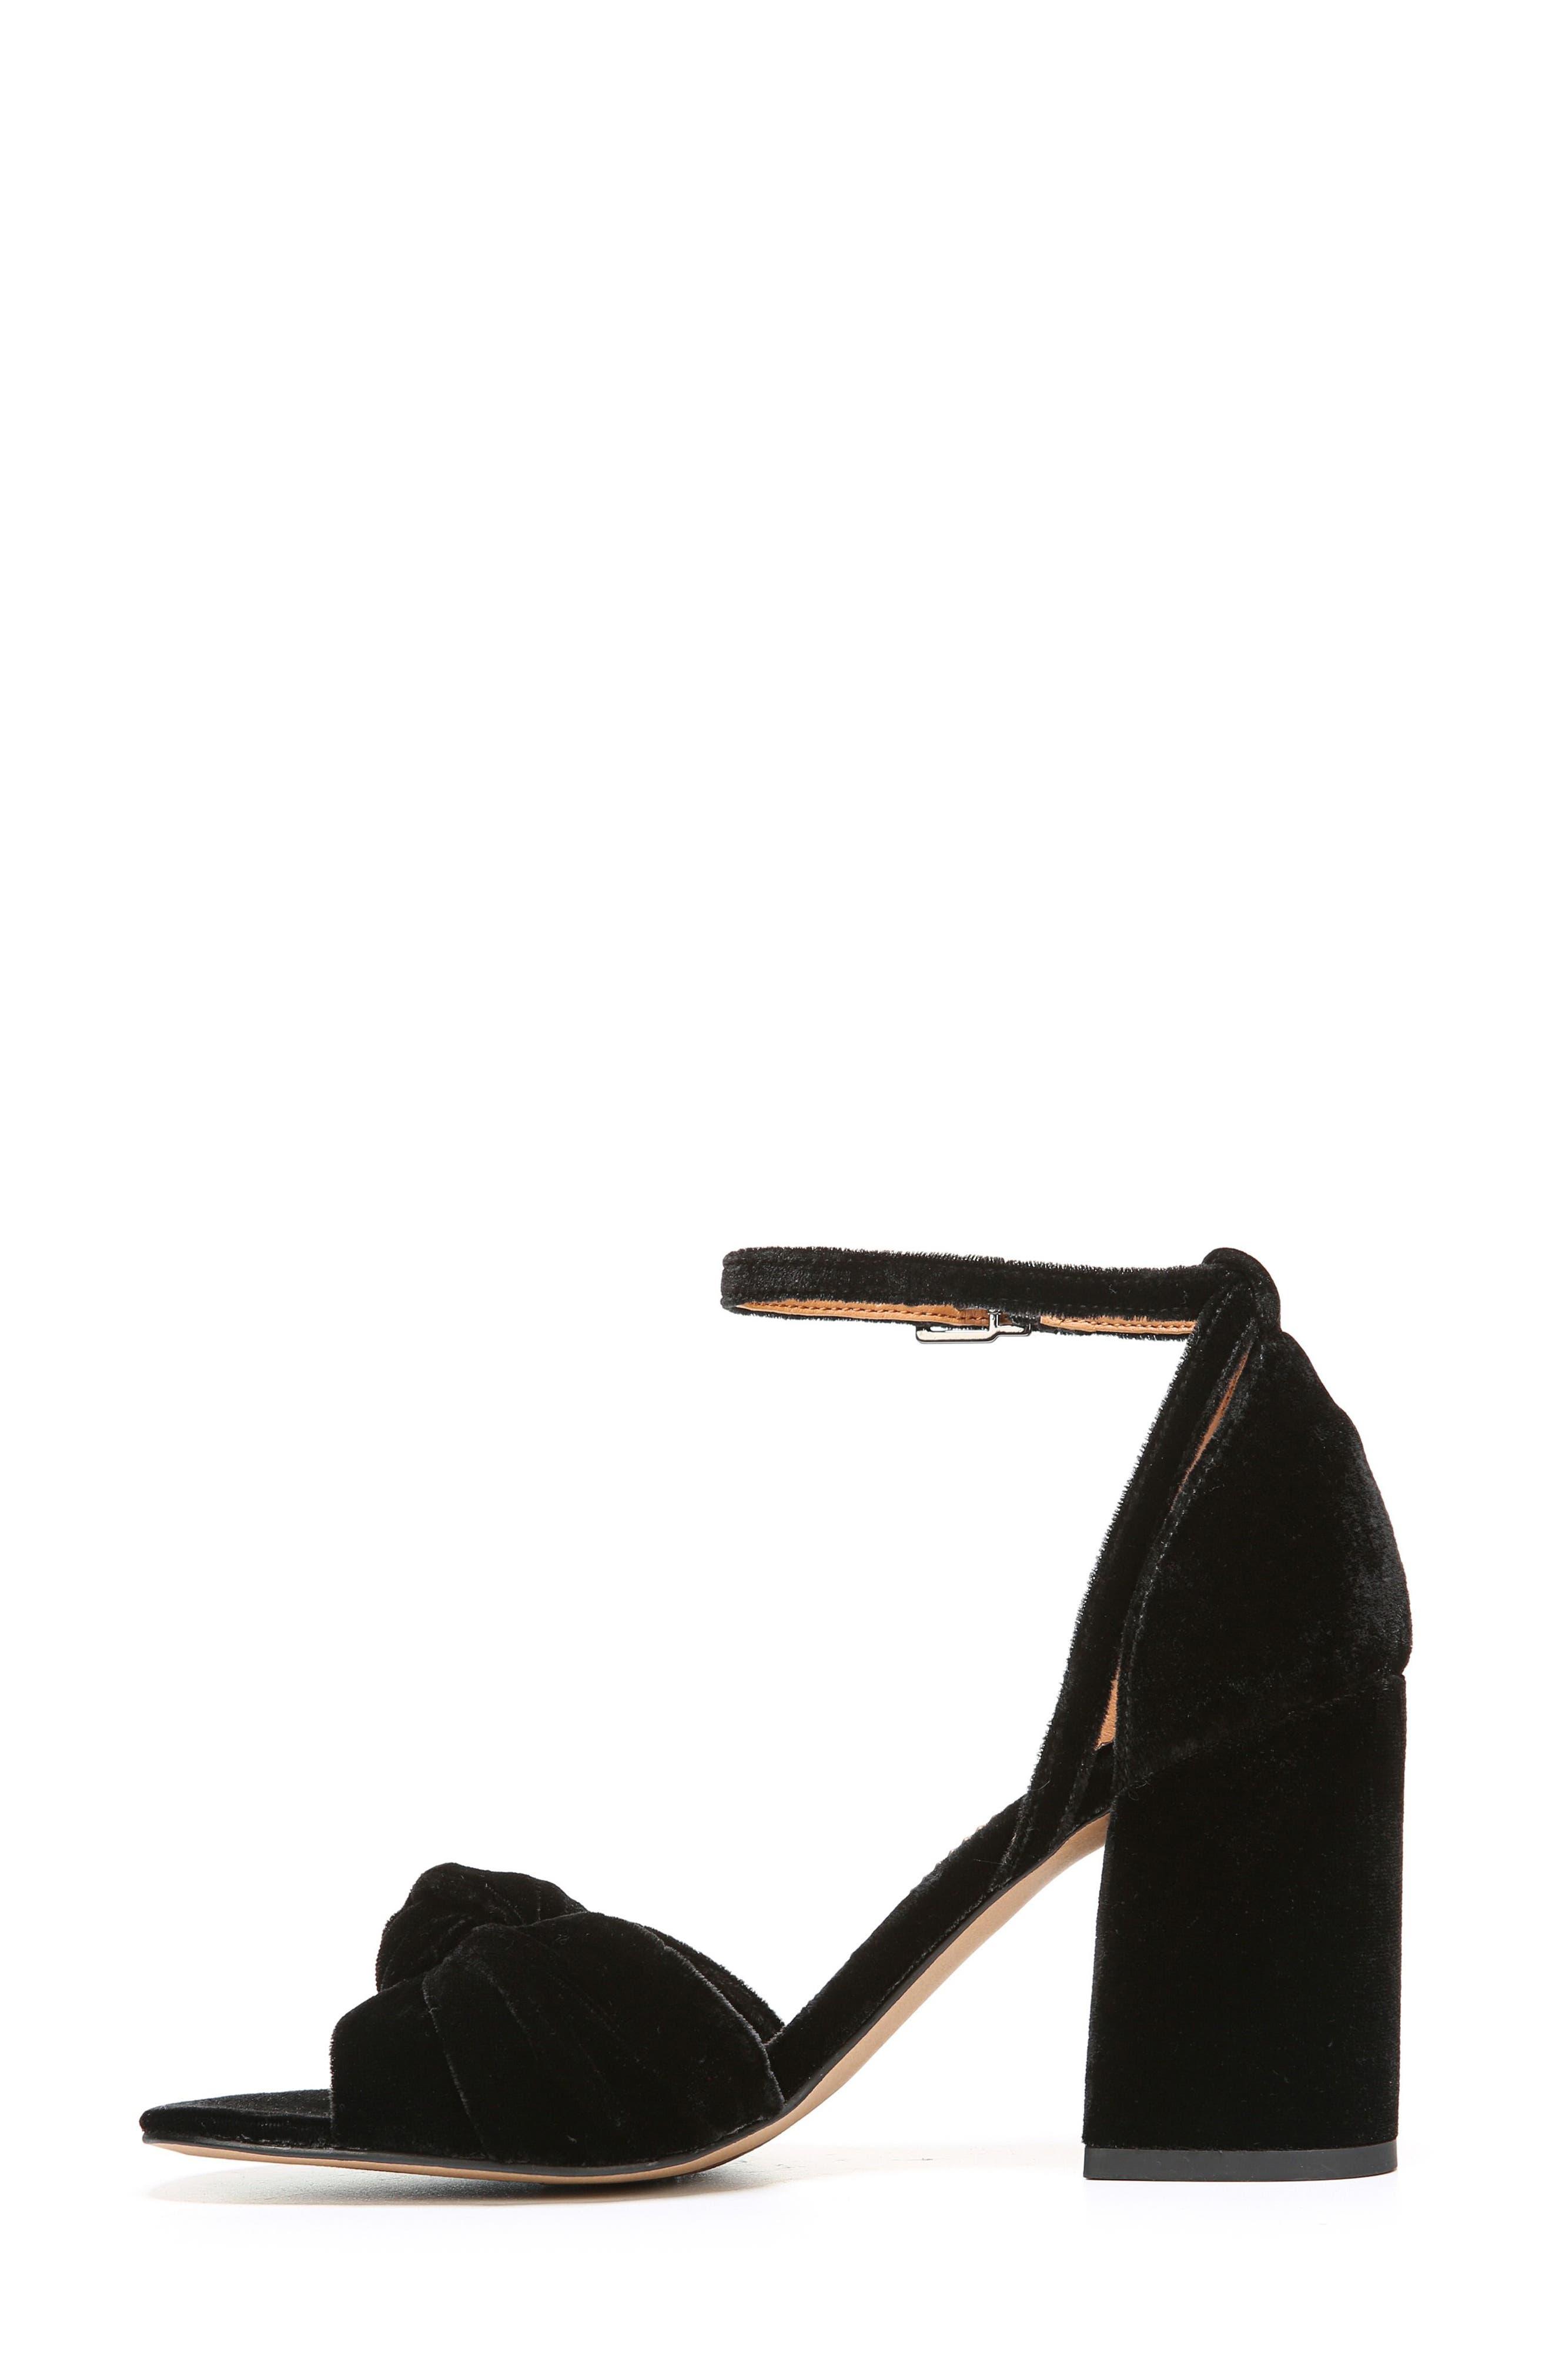 Edana Knotted Block Heel Sandal,                             Alternate thumbnail 2, color,                             001